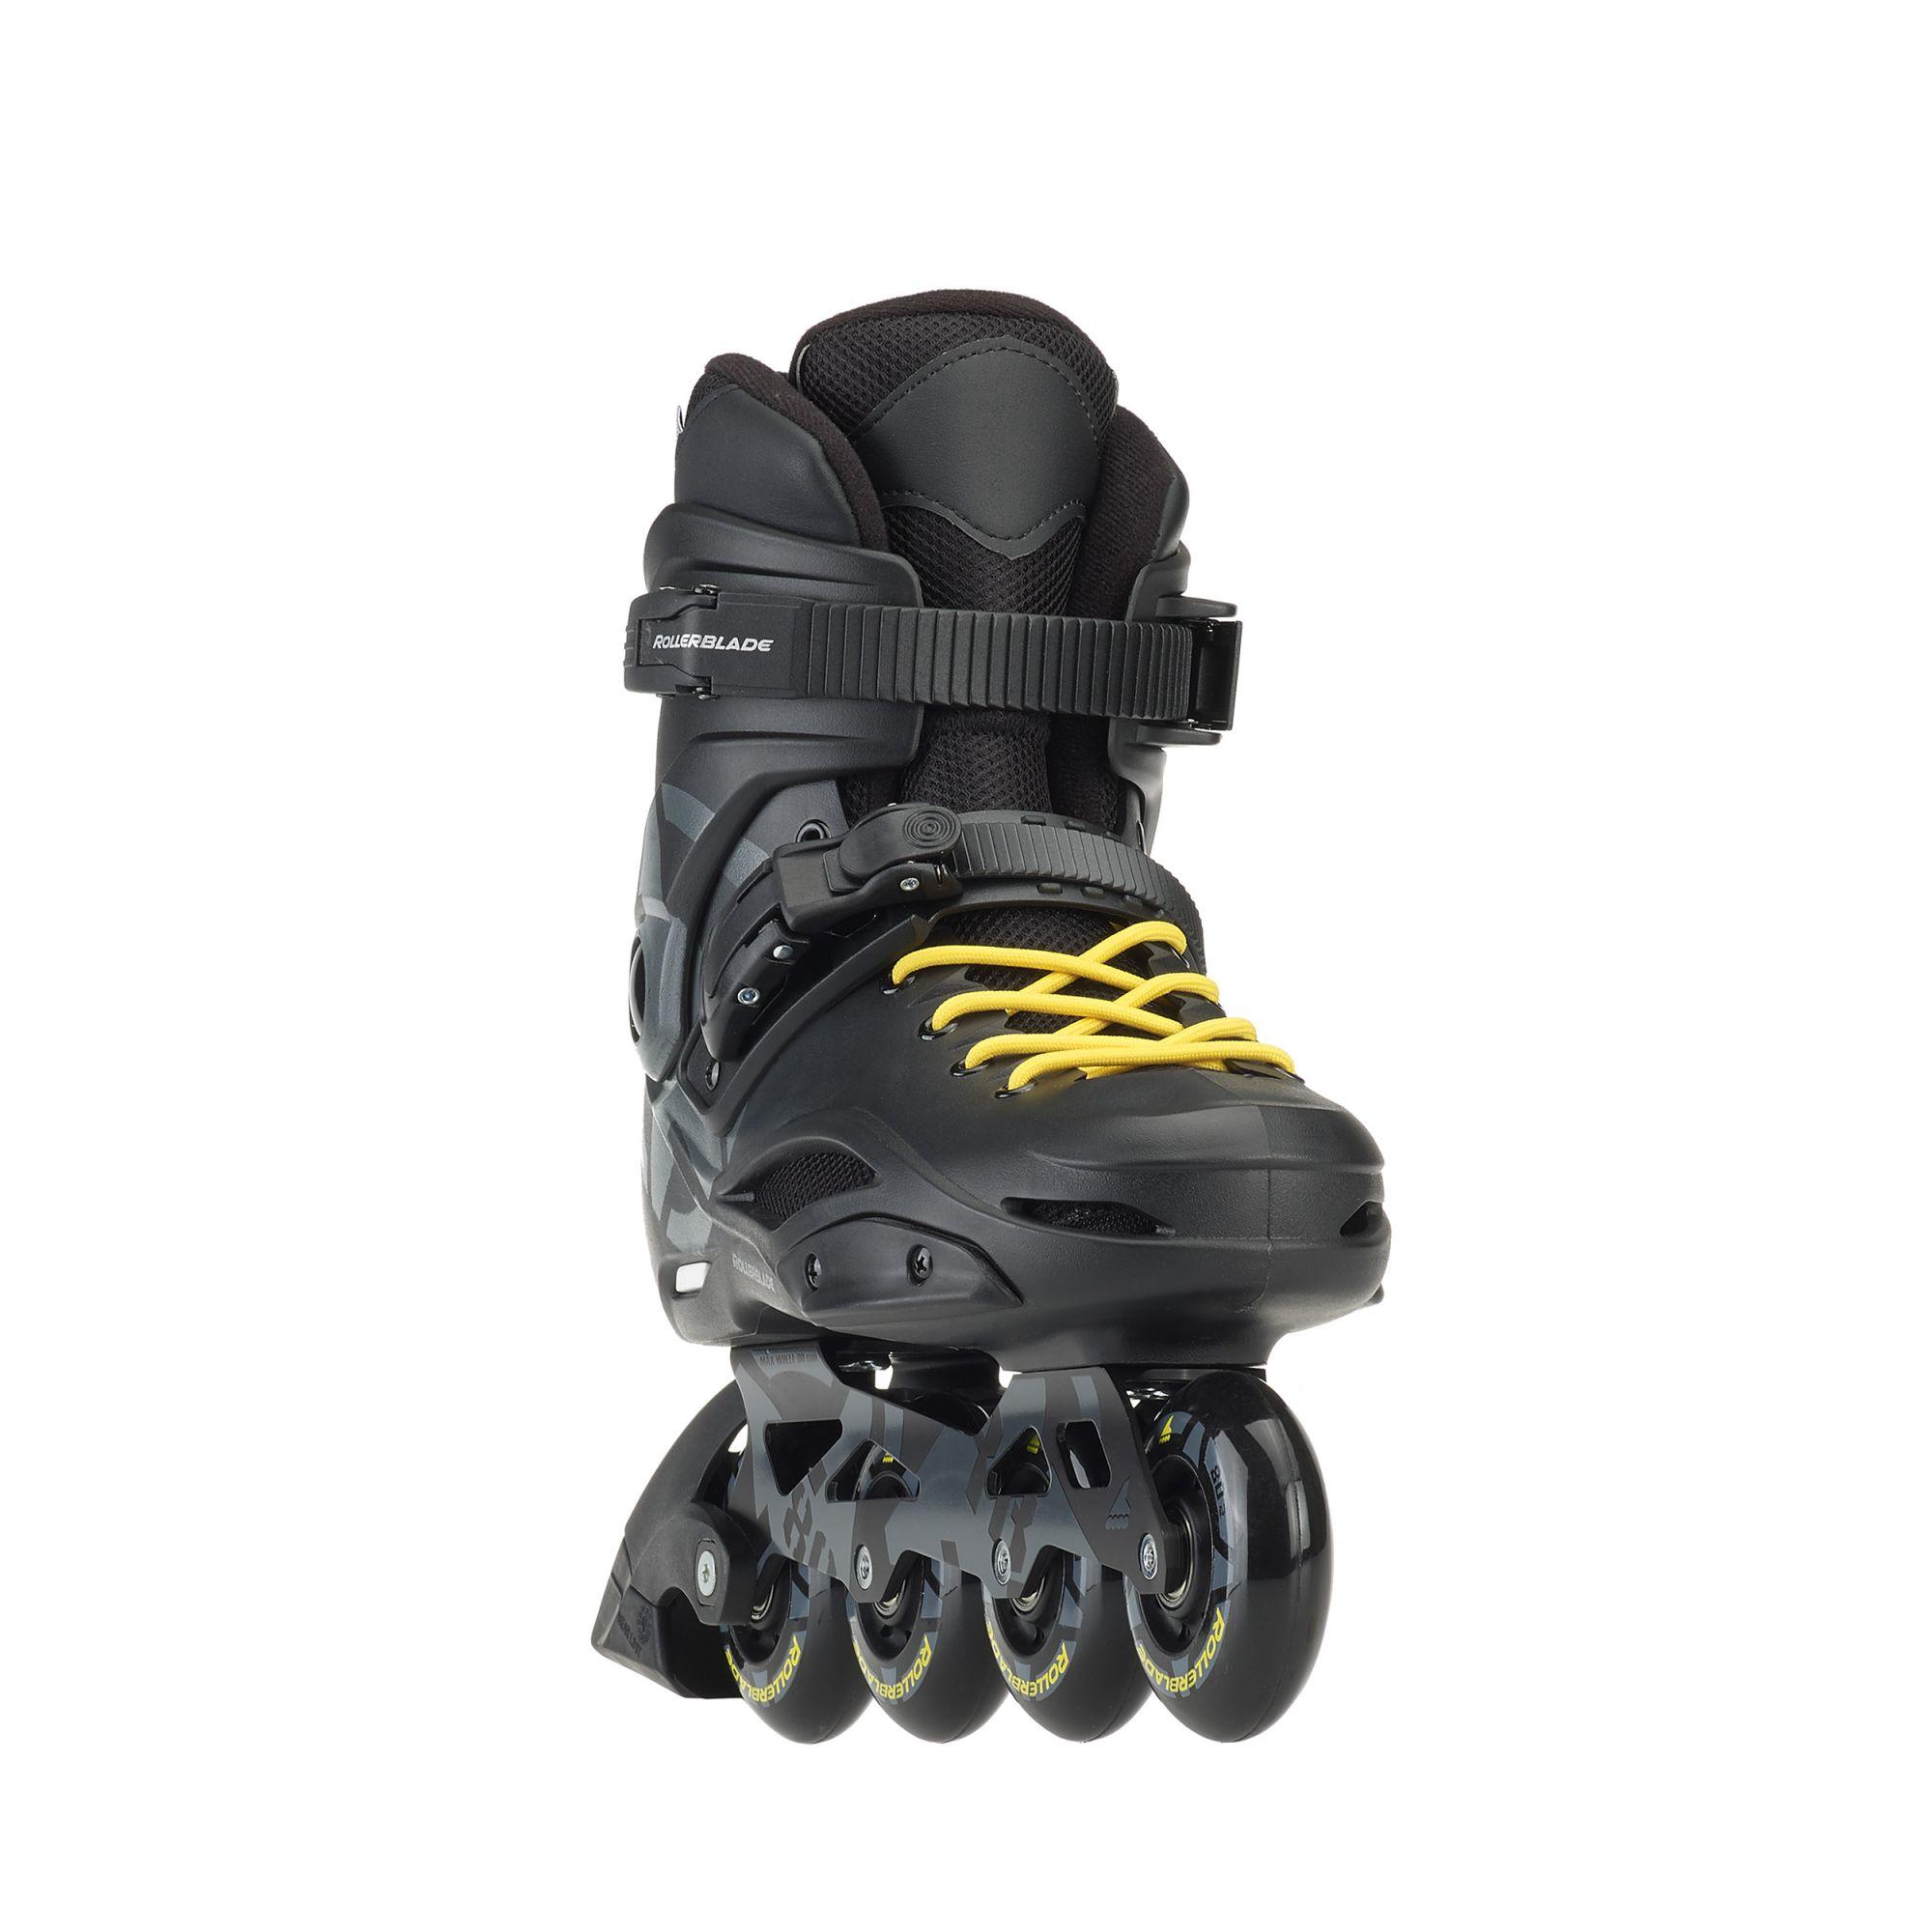 9731129ae62be4 Rollerblade RB 80 - 2018 Black/Yellow, купить в Москве